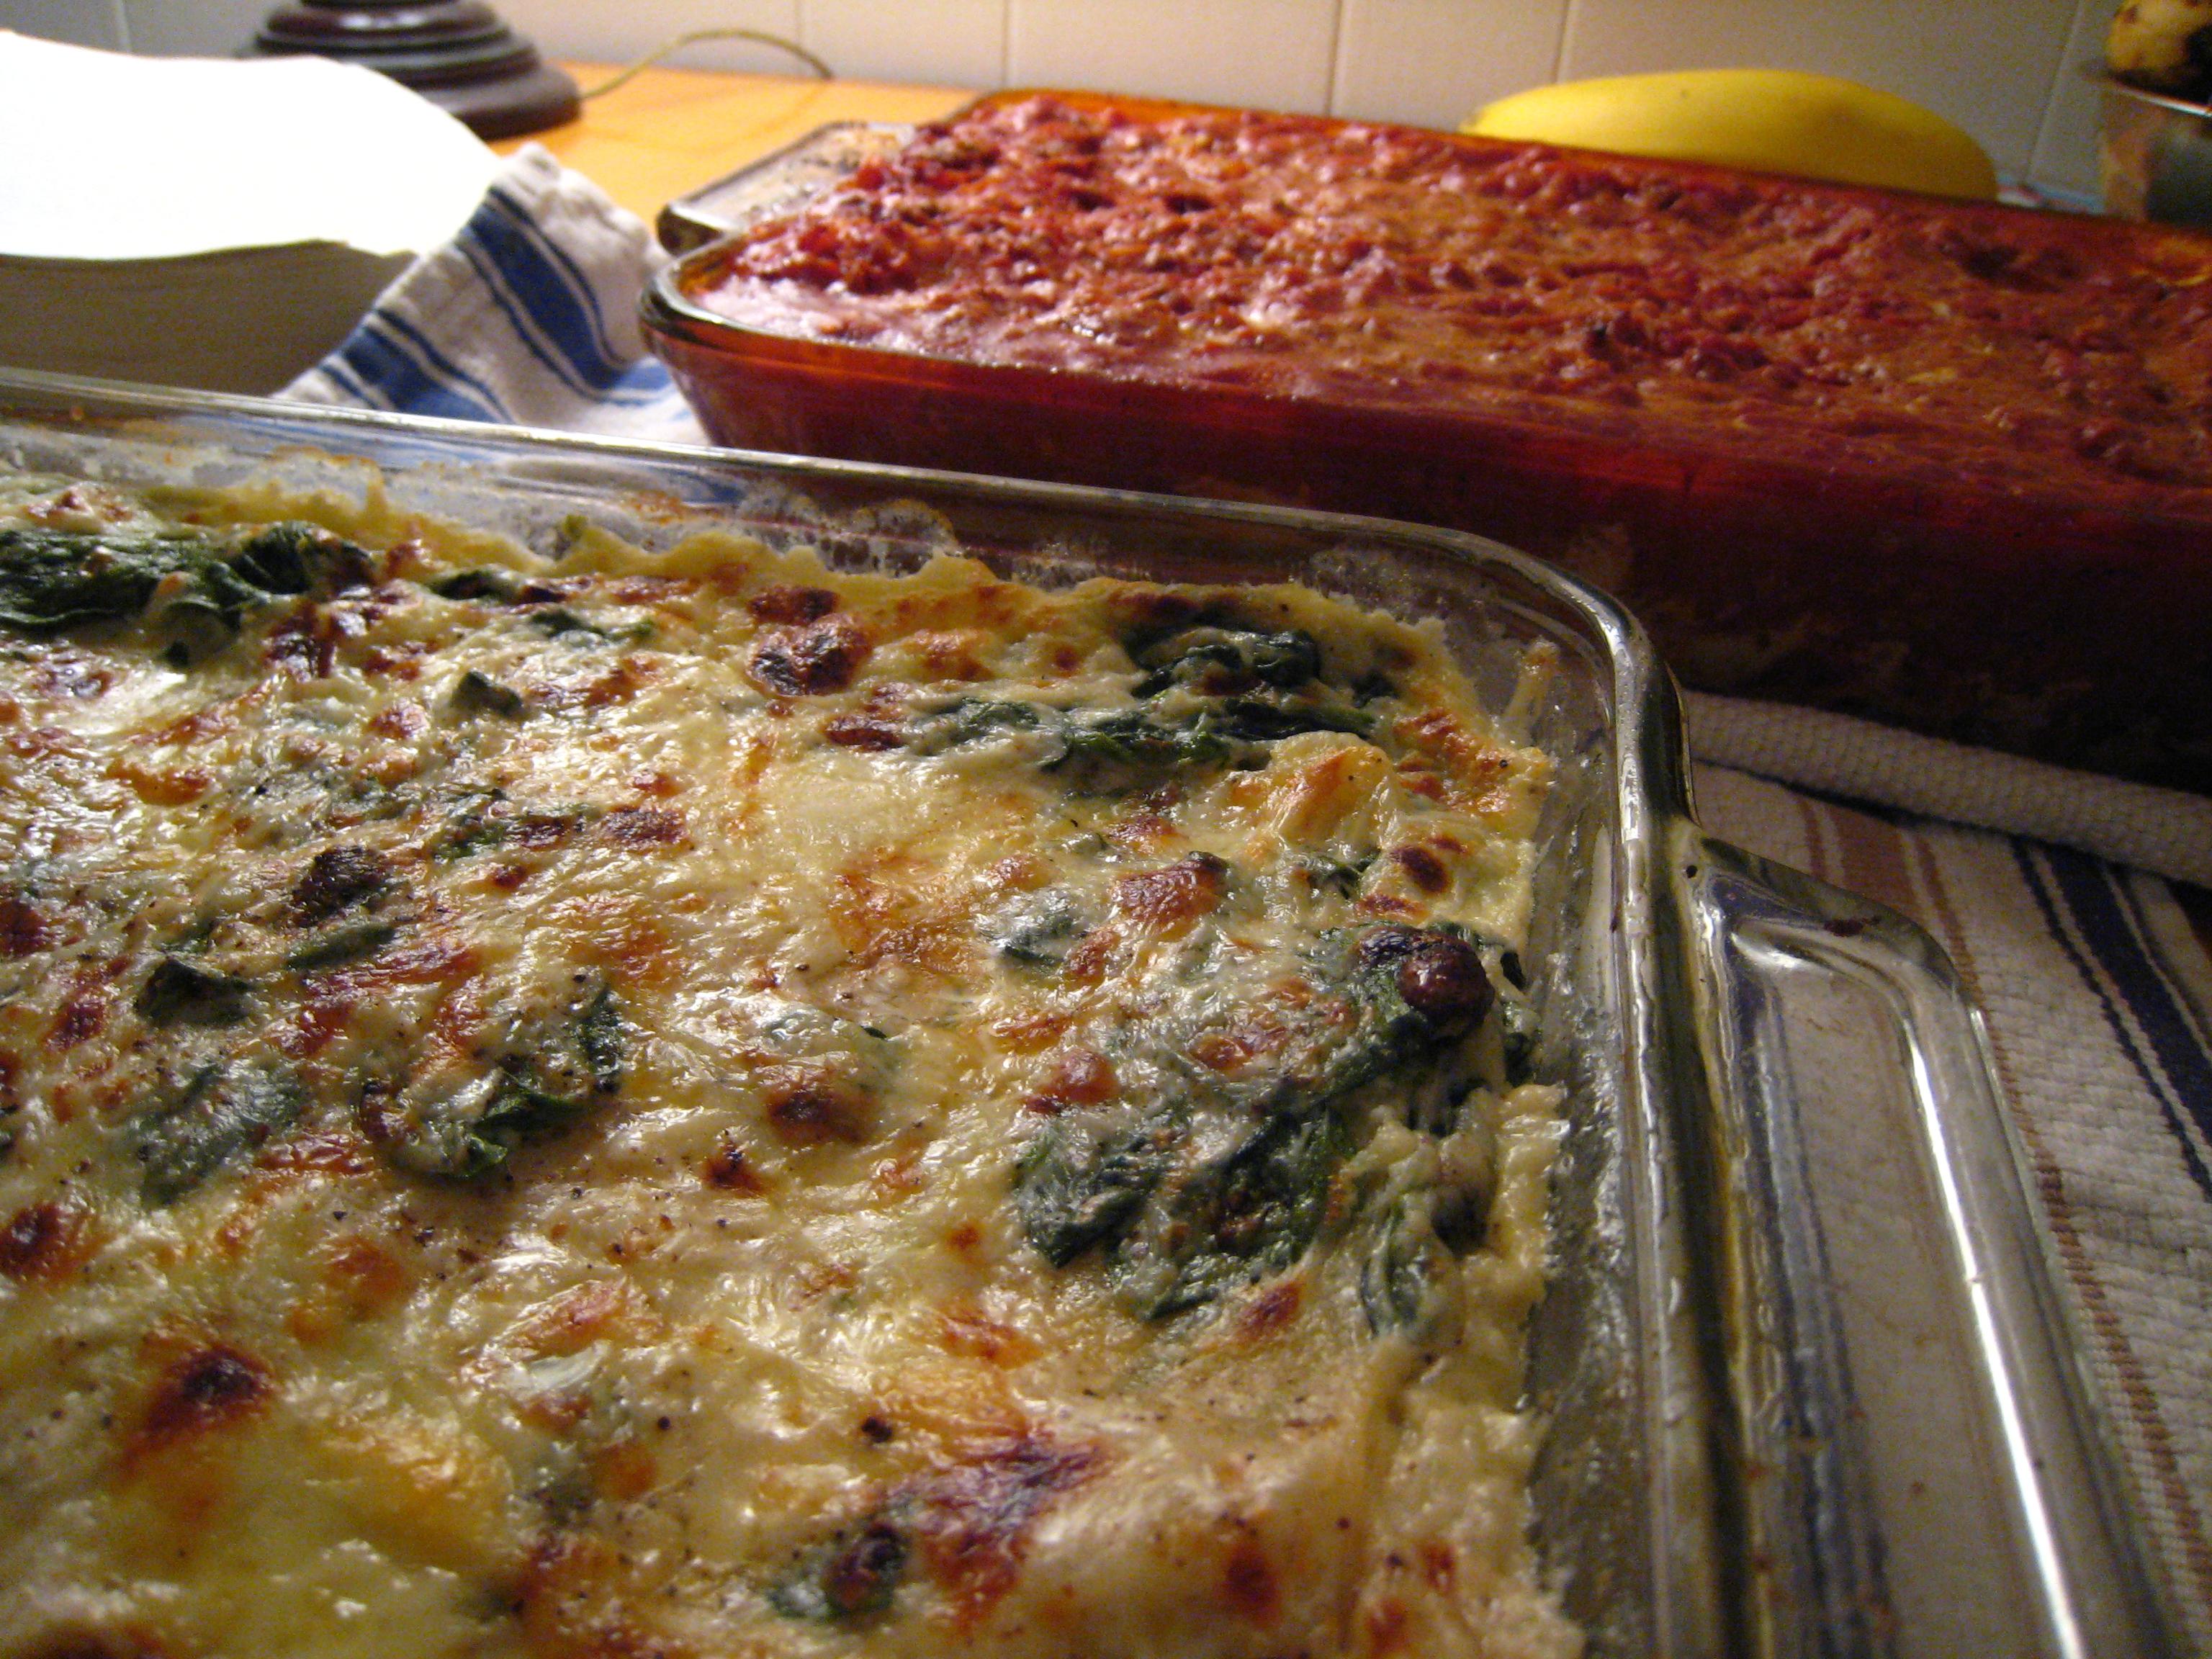 Lasagna | Spinach Lasagna / Three Meat | By: mrgarin | Flickr - Photo ...